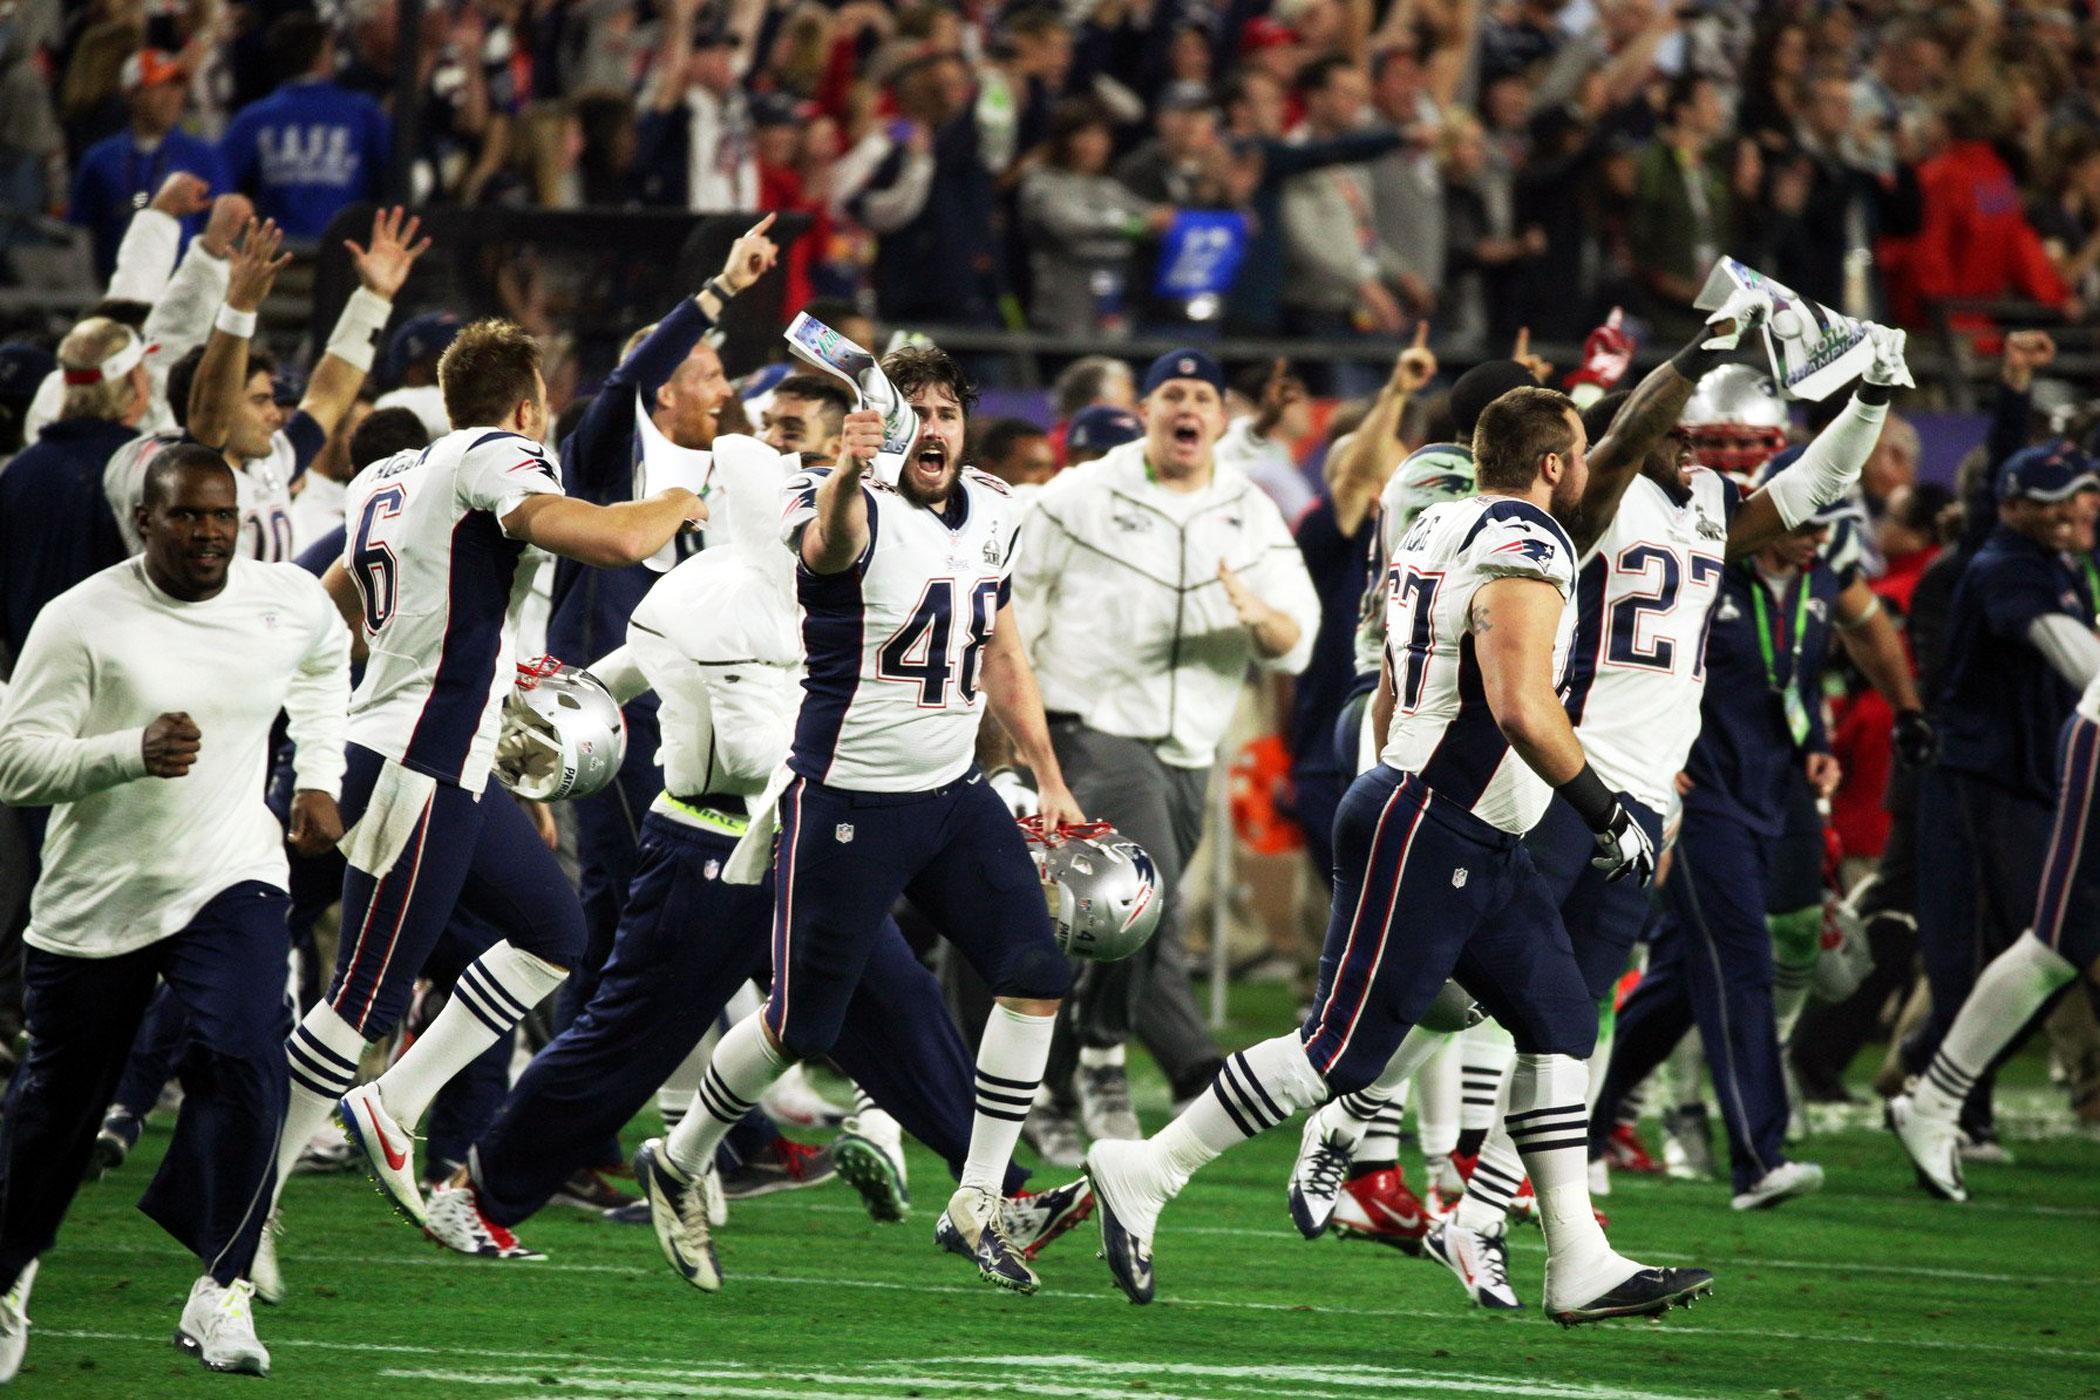 Super Bowl XLIX, Feb. 1, 2015                               New England Patriots vs Seattle Seahawks in Phoenix, Ariz.